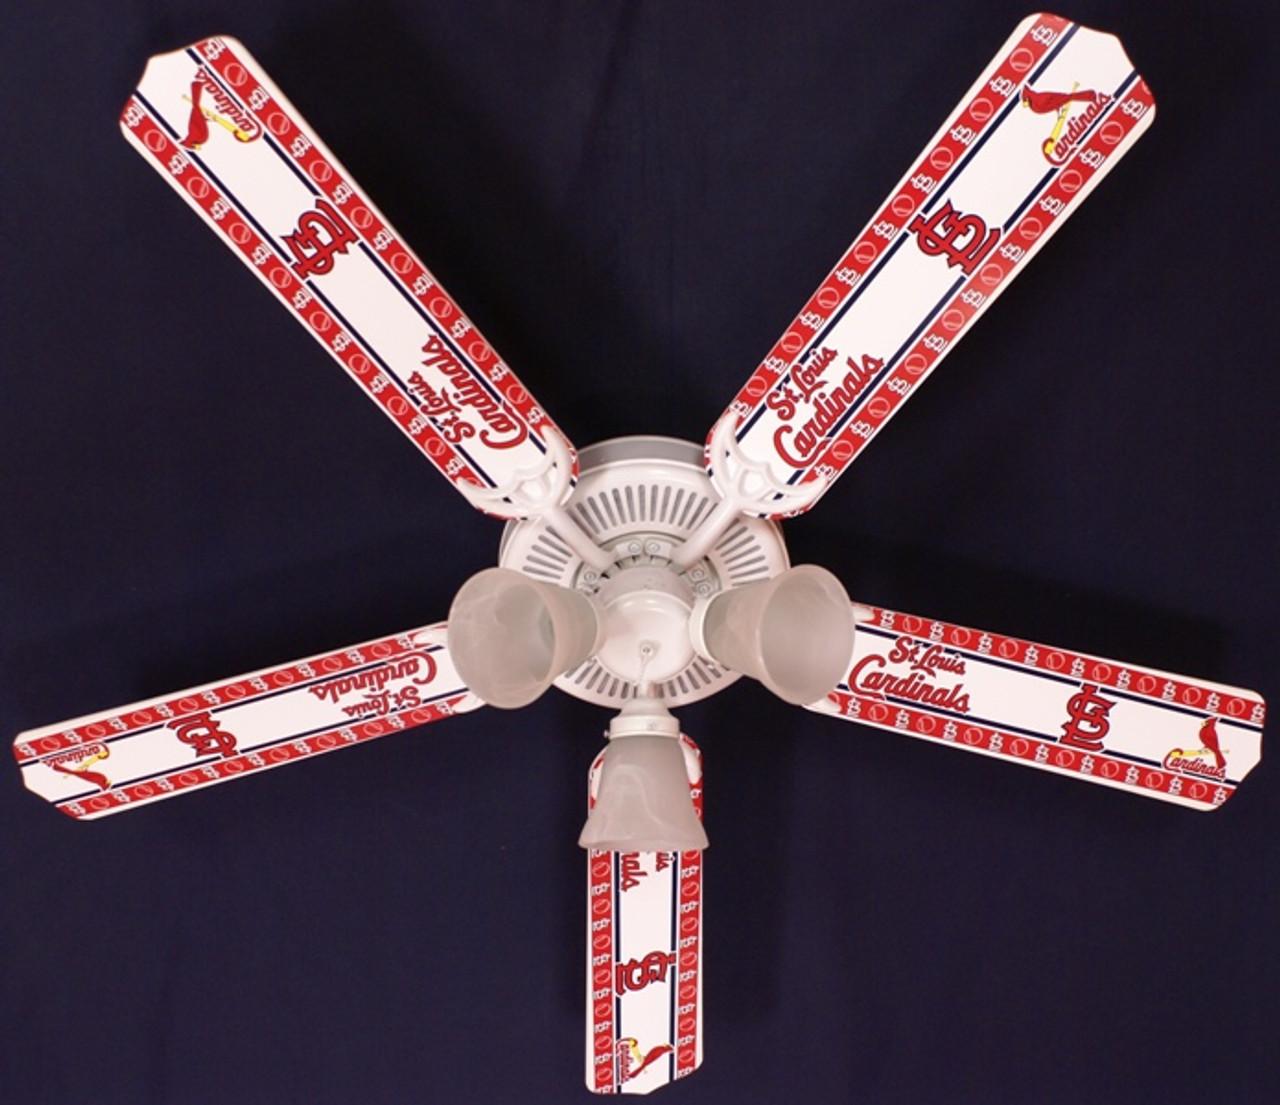 Mlb St Louis Cardinals Baseball Ceiling Fan 52 Ceiling Fans